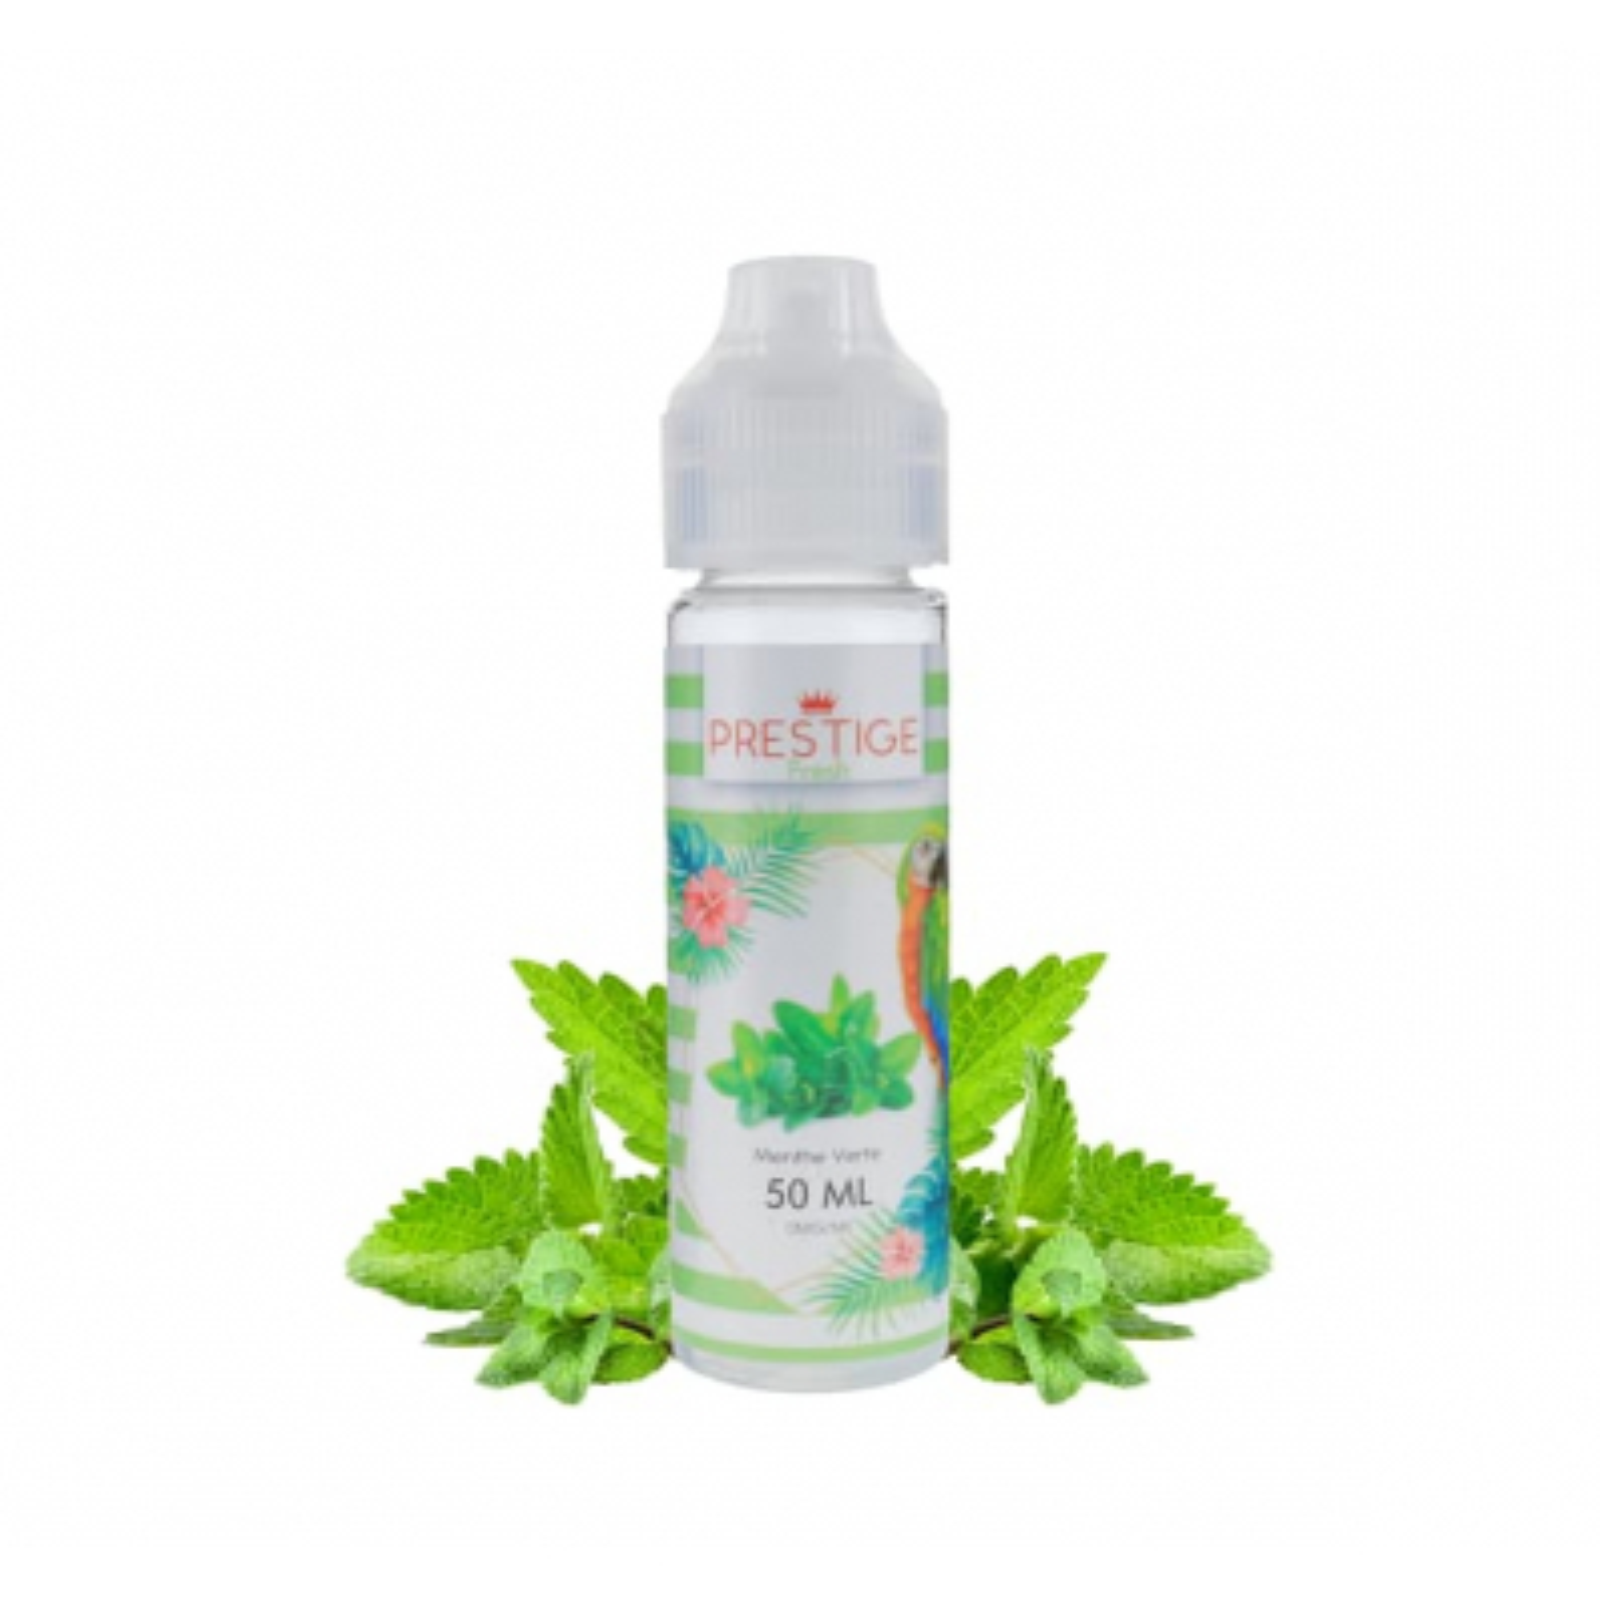 Menthe Verte 50ml - Prestige Fresh